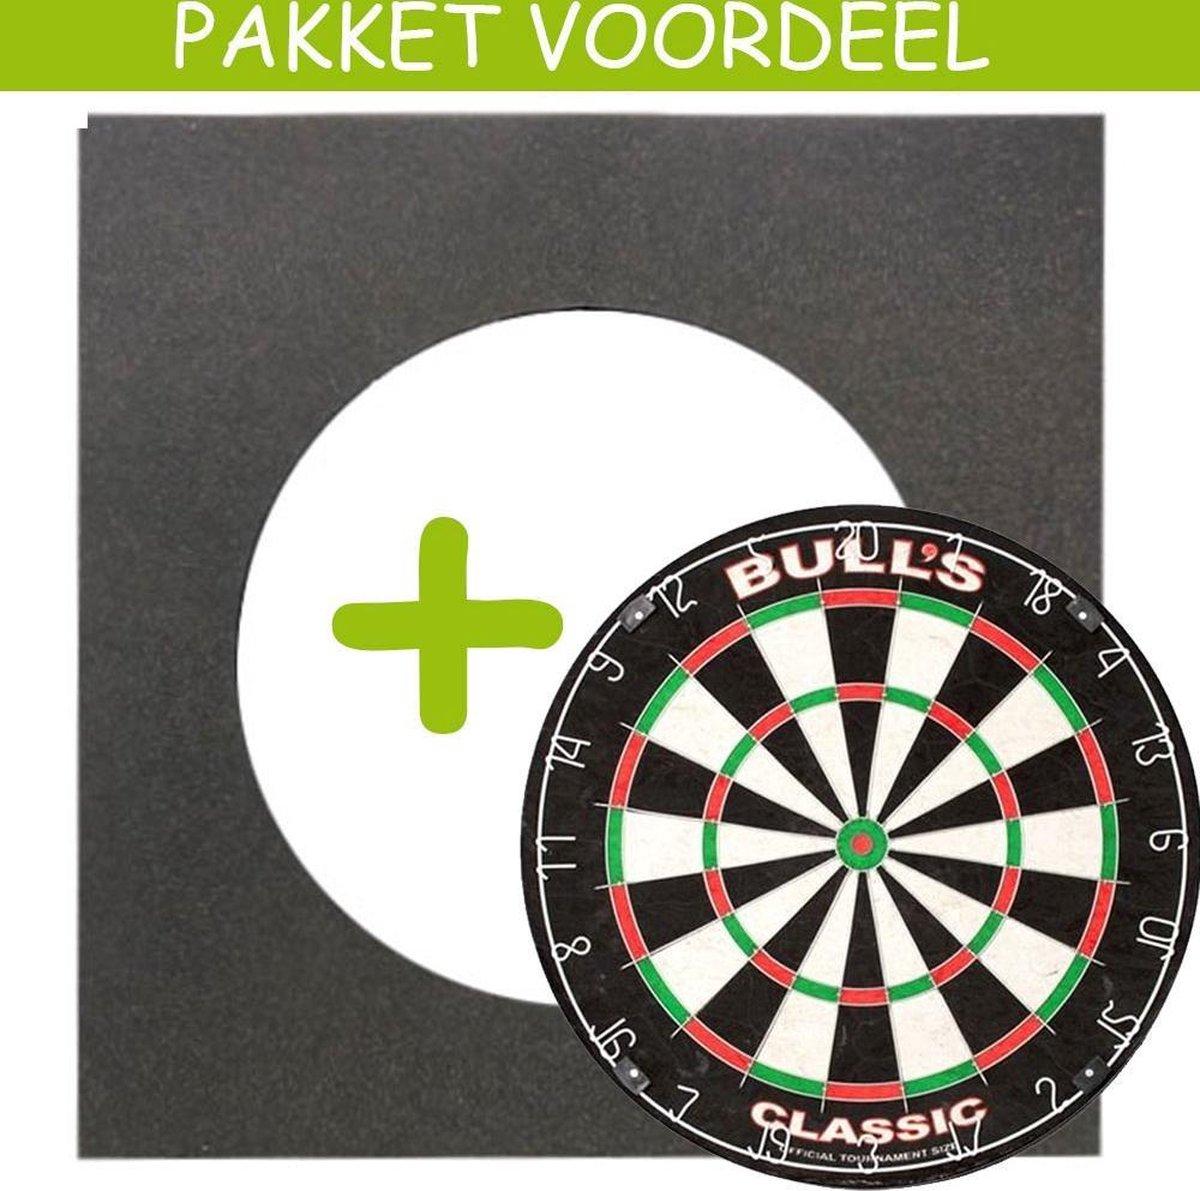 Surround VoordeelPakket Basic - Bulls Classic - Vierkant-